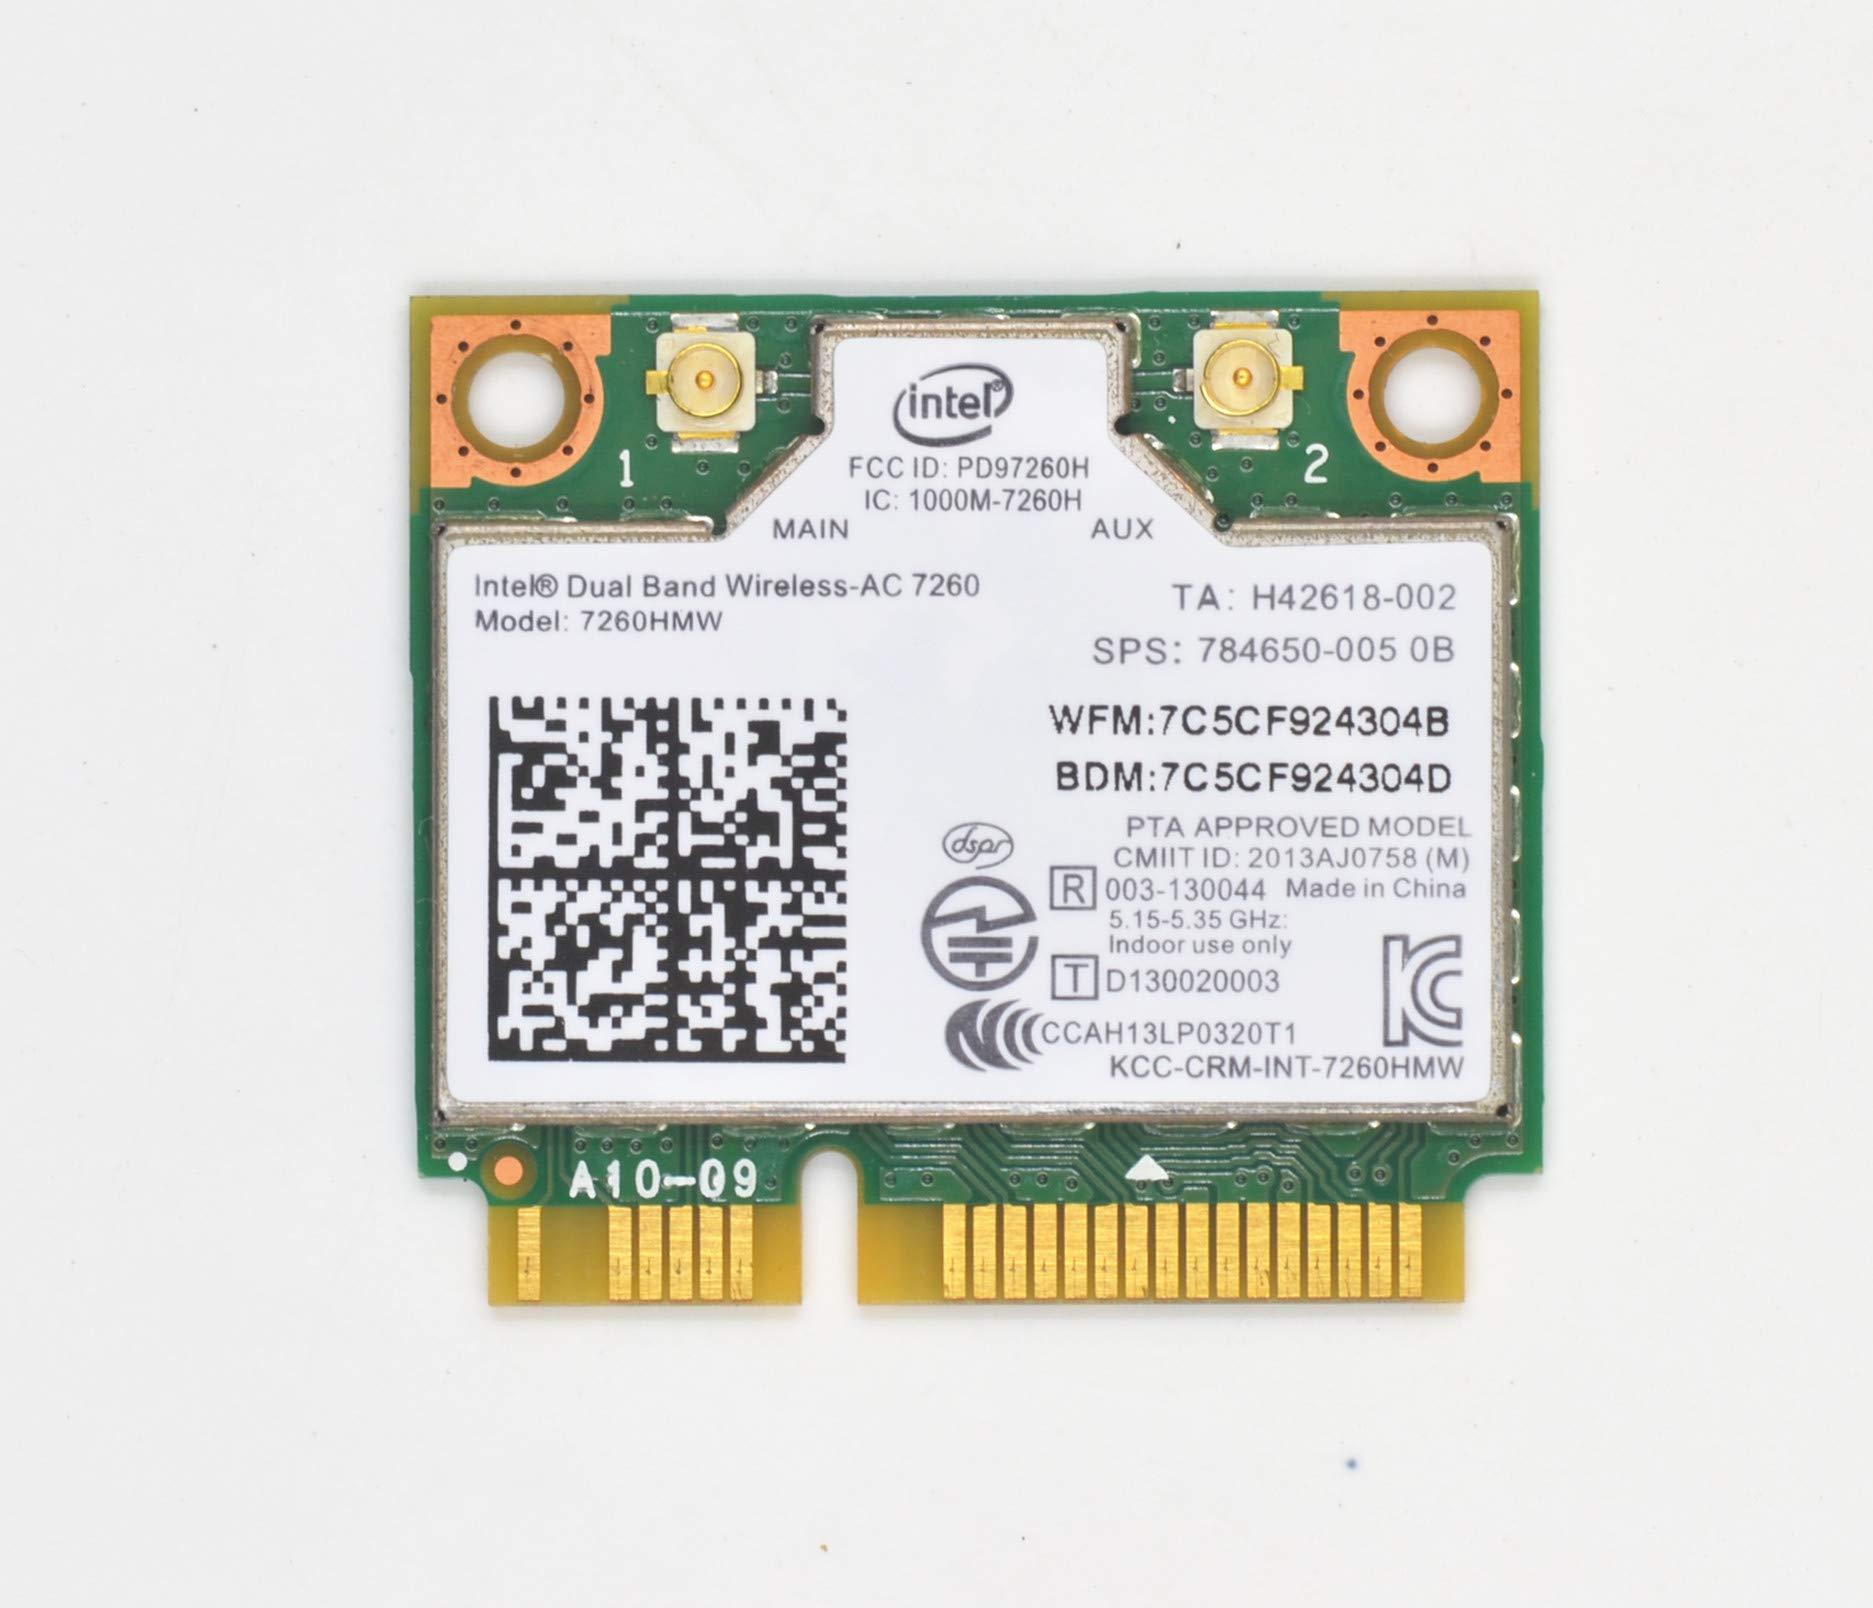 Mini PCIe Network Card Intel 7260HMW,Dual Band Wireless-AC 7